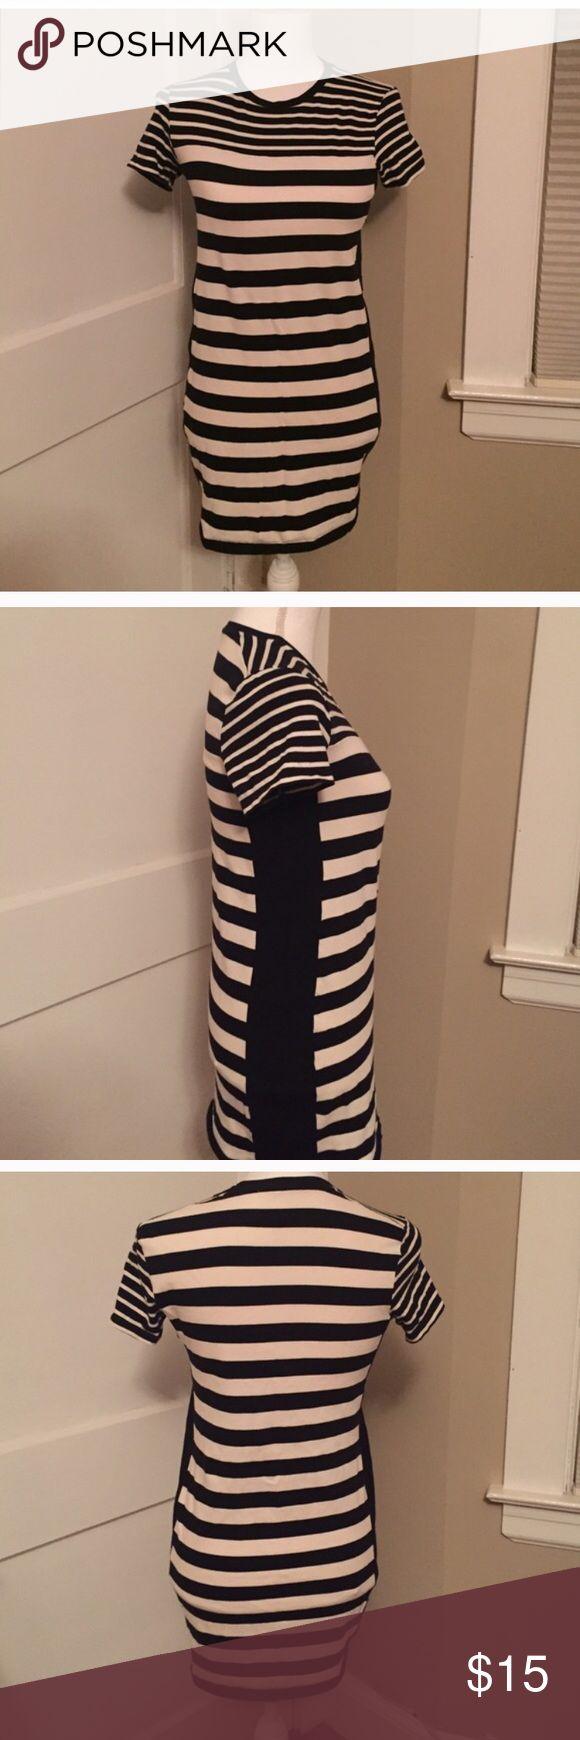 "Zara striped black and white mini dress Casual cotton blend mini dress, 28"" shoulders down. Zara Dresses"